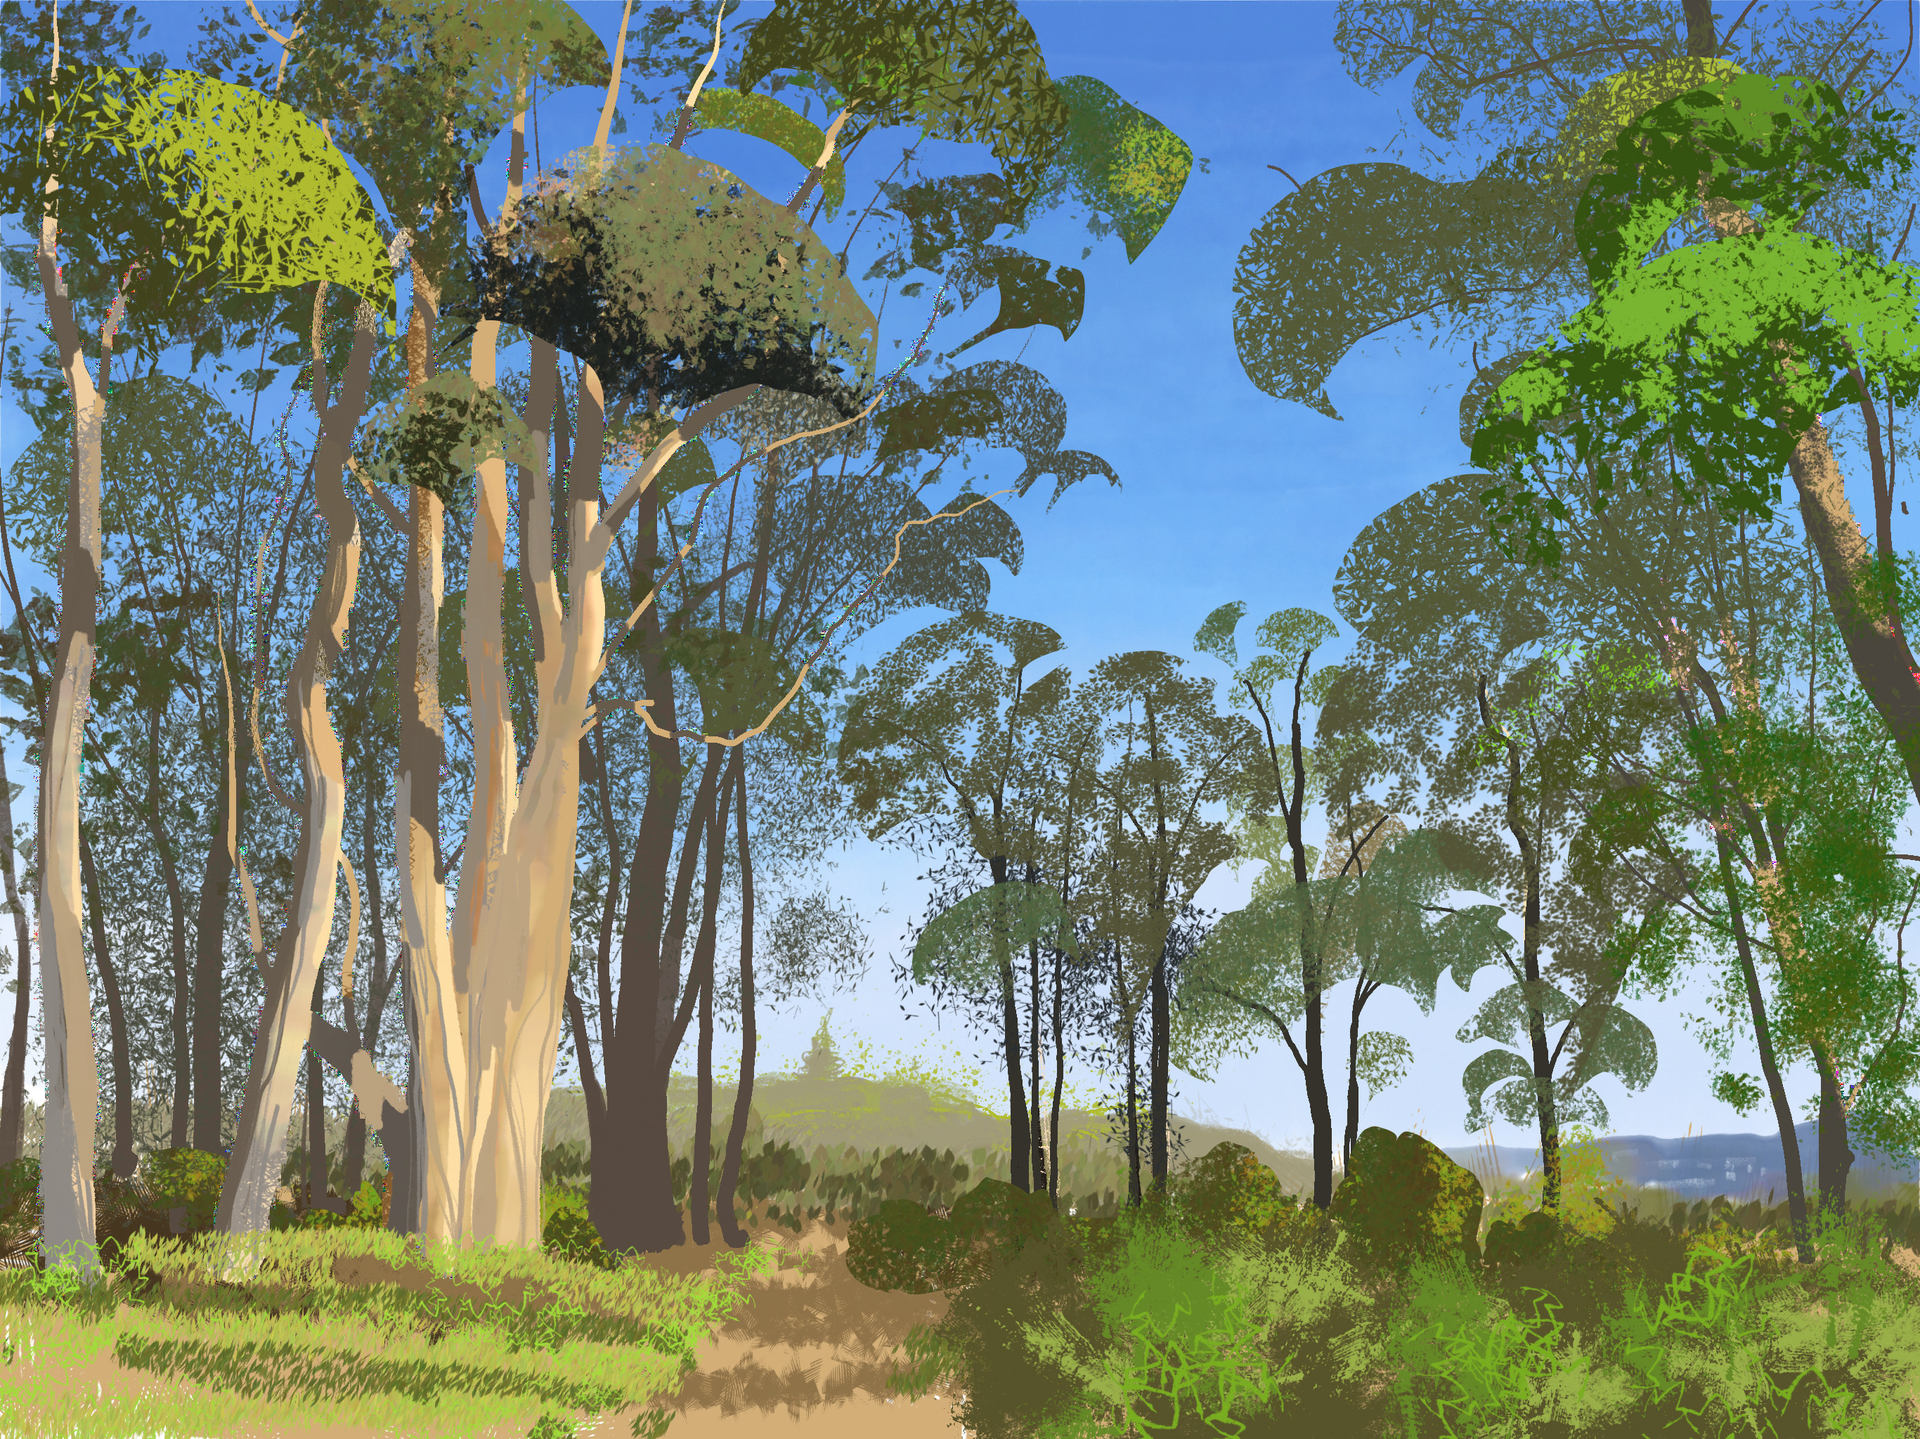 Eucaliptus trees